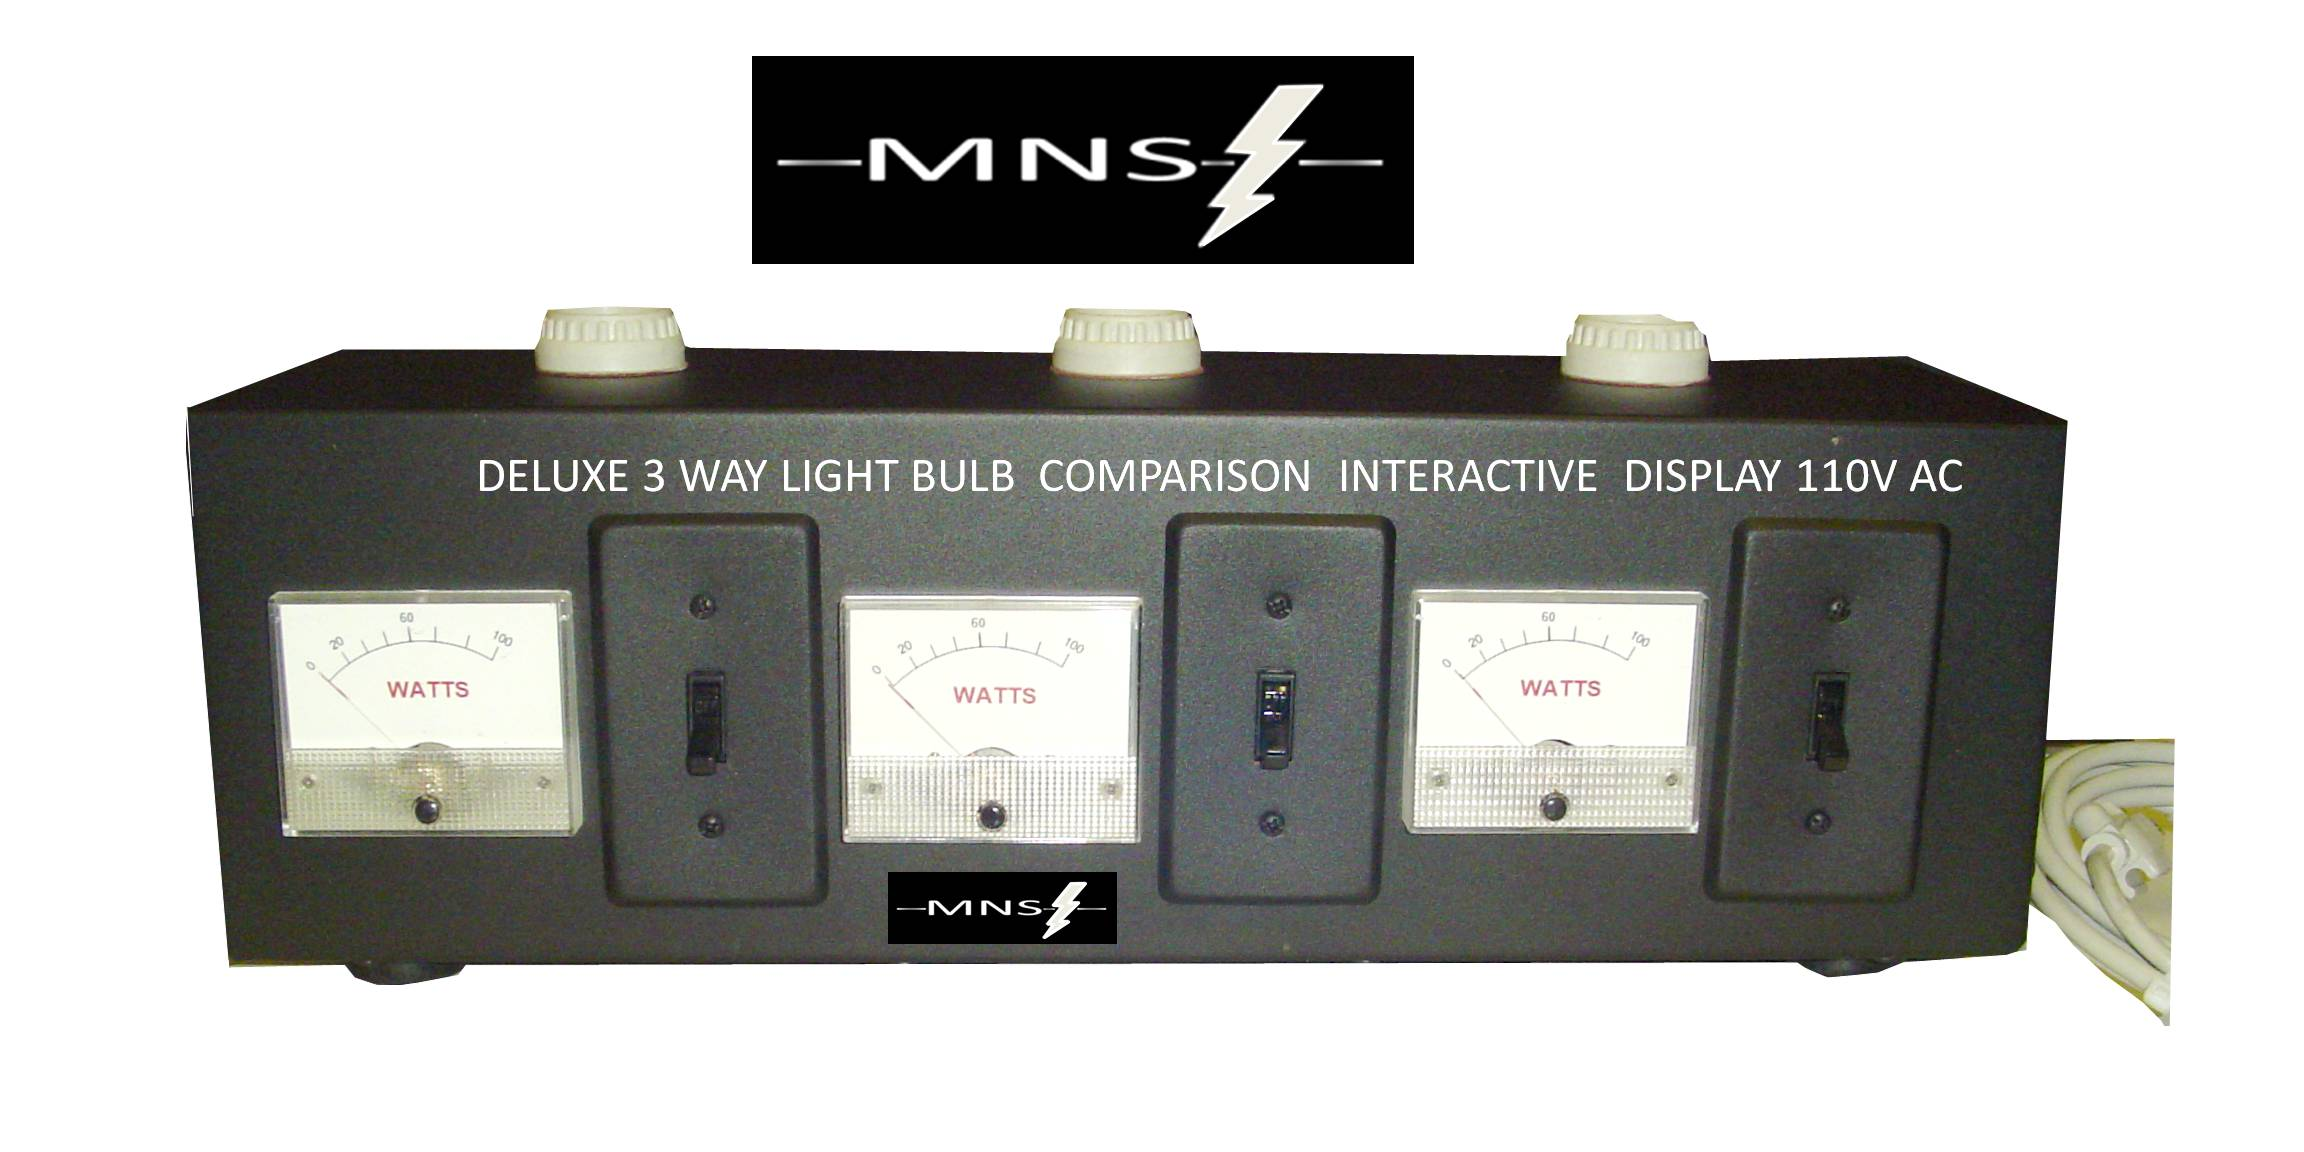 3 way displays ford f 150 radio wiring diagram interactive light box display bulbs 110vac pedal power